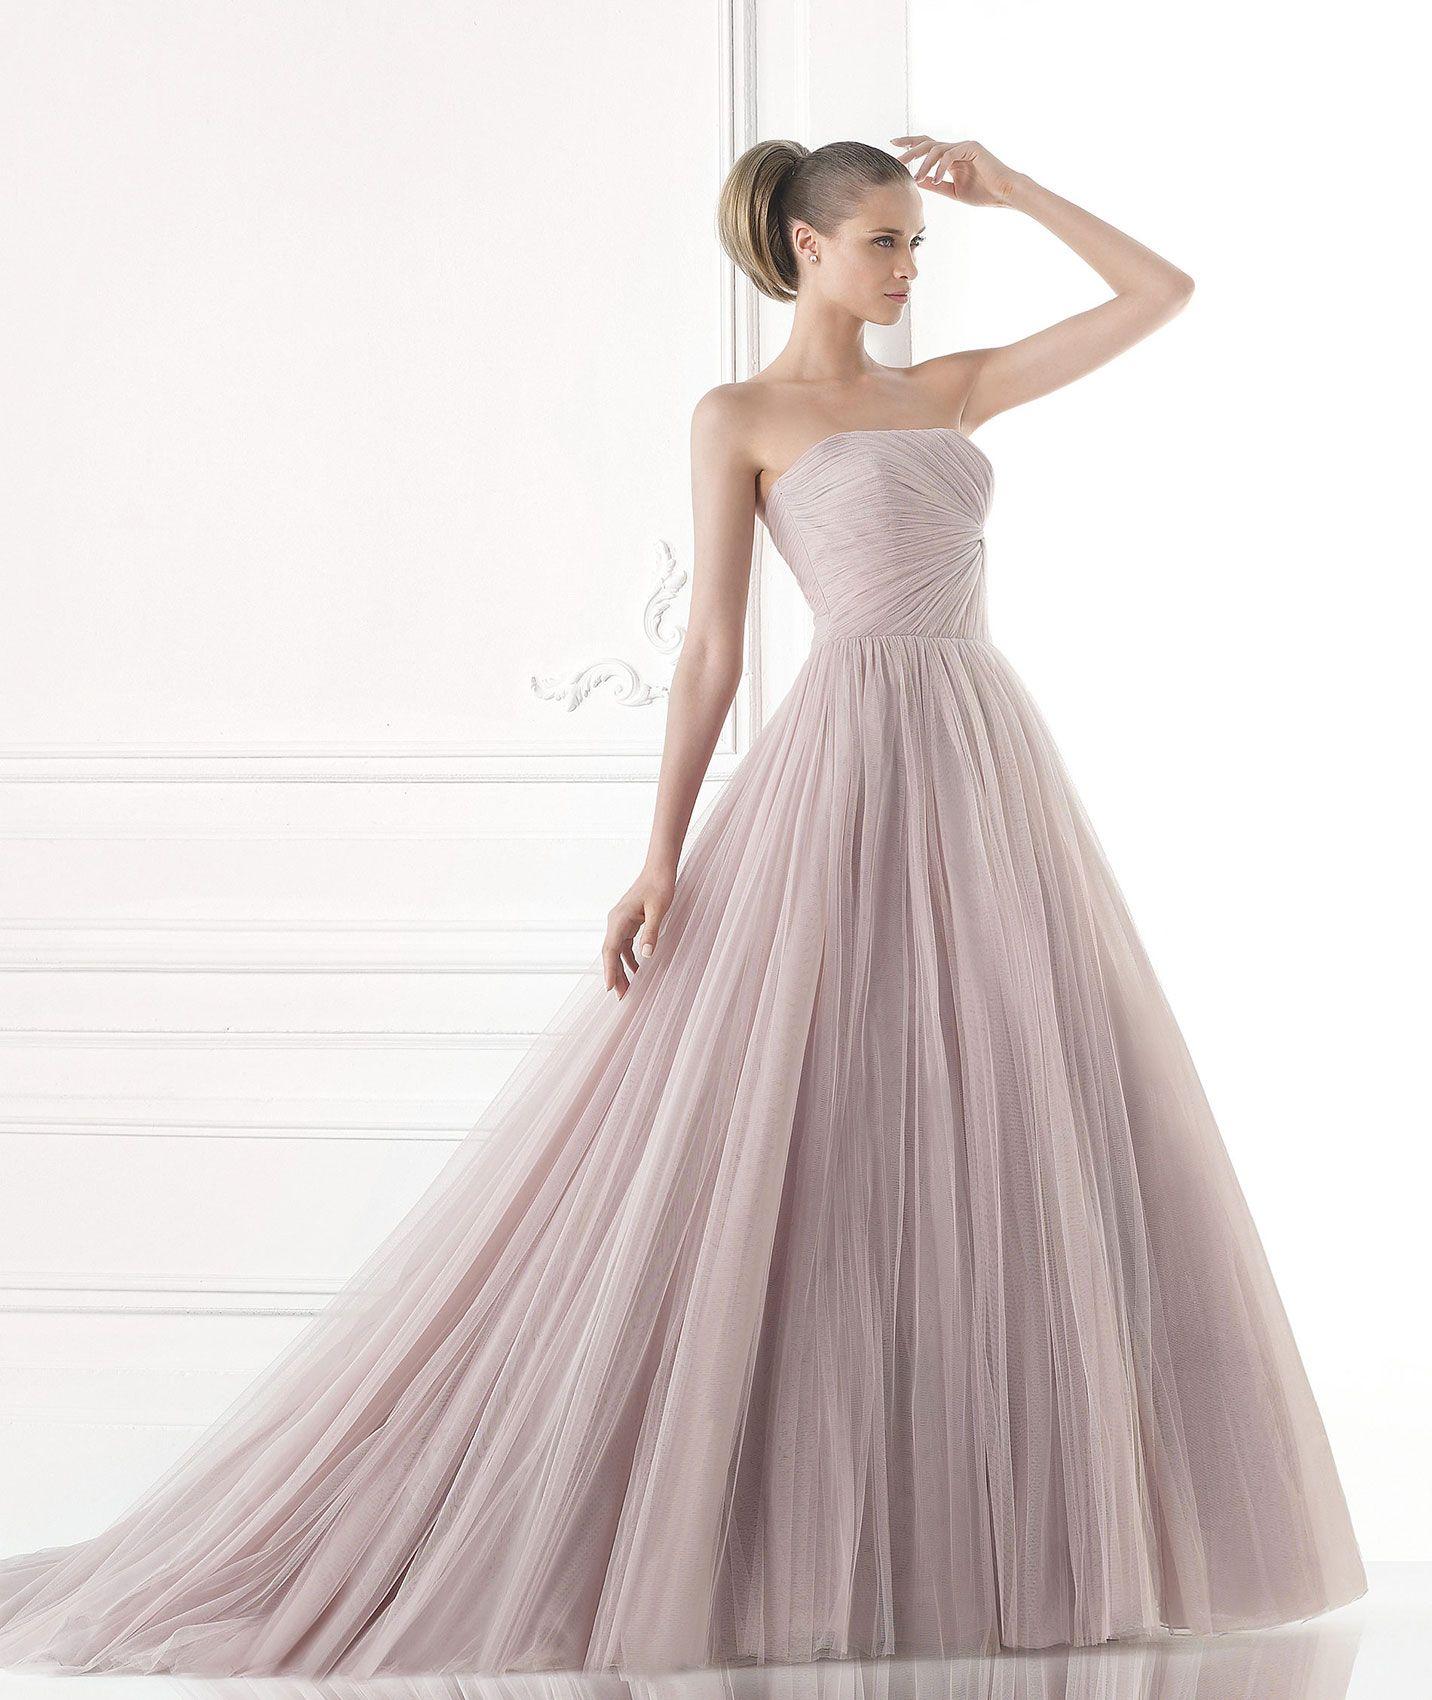 Malaika Wedding Dress 2015 Abiti Da Sposa 2015 Vestito Da Sposa Rosa Abiti Da Sposa